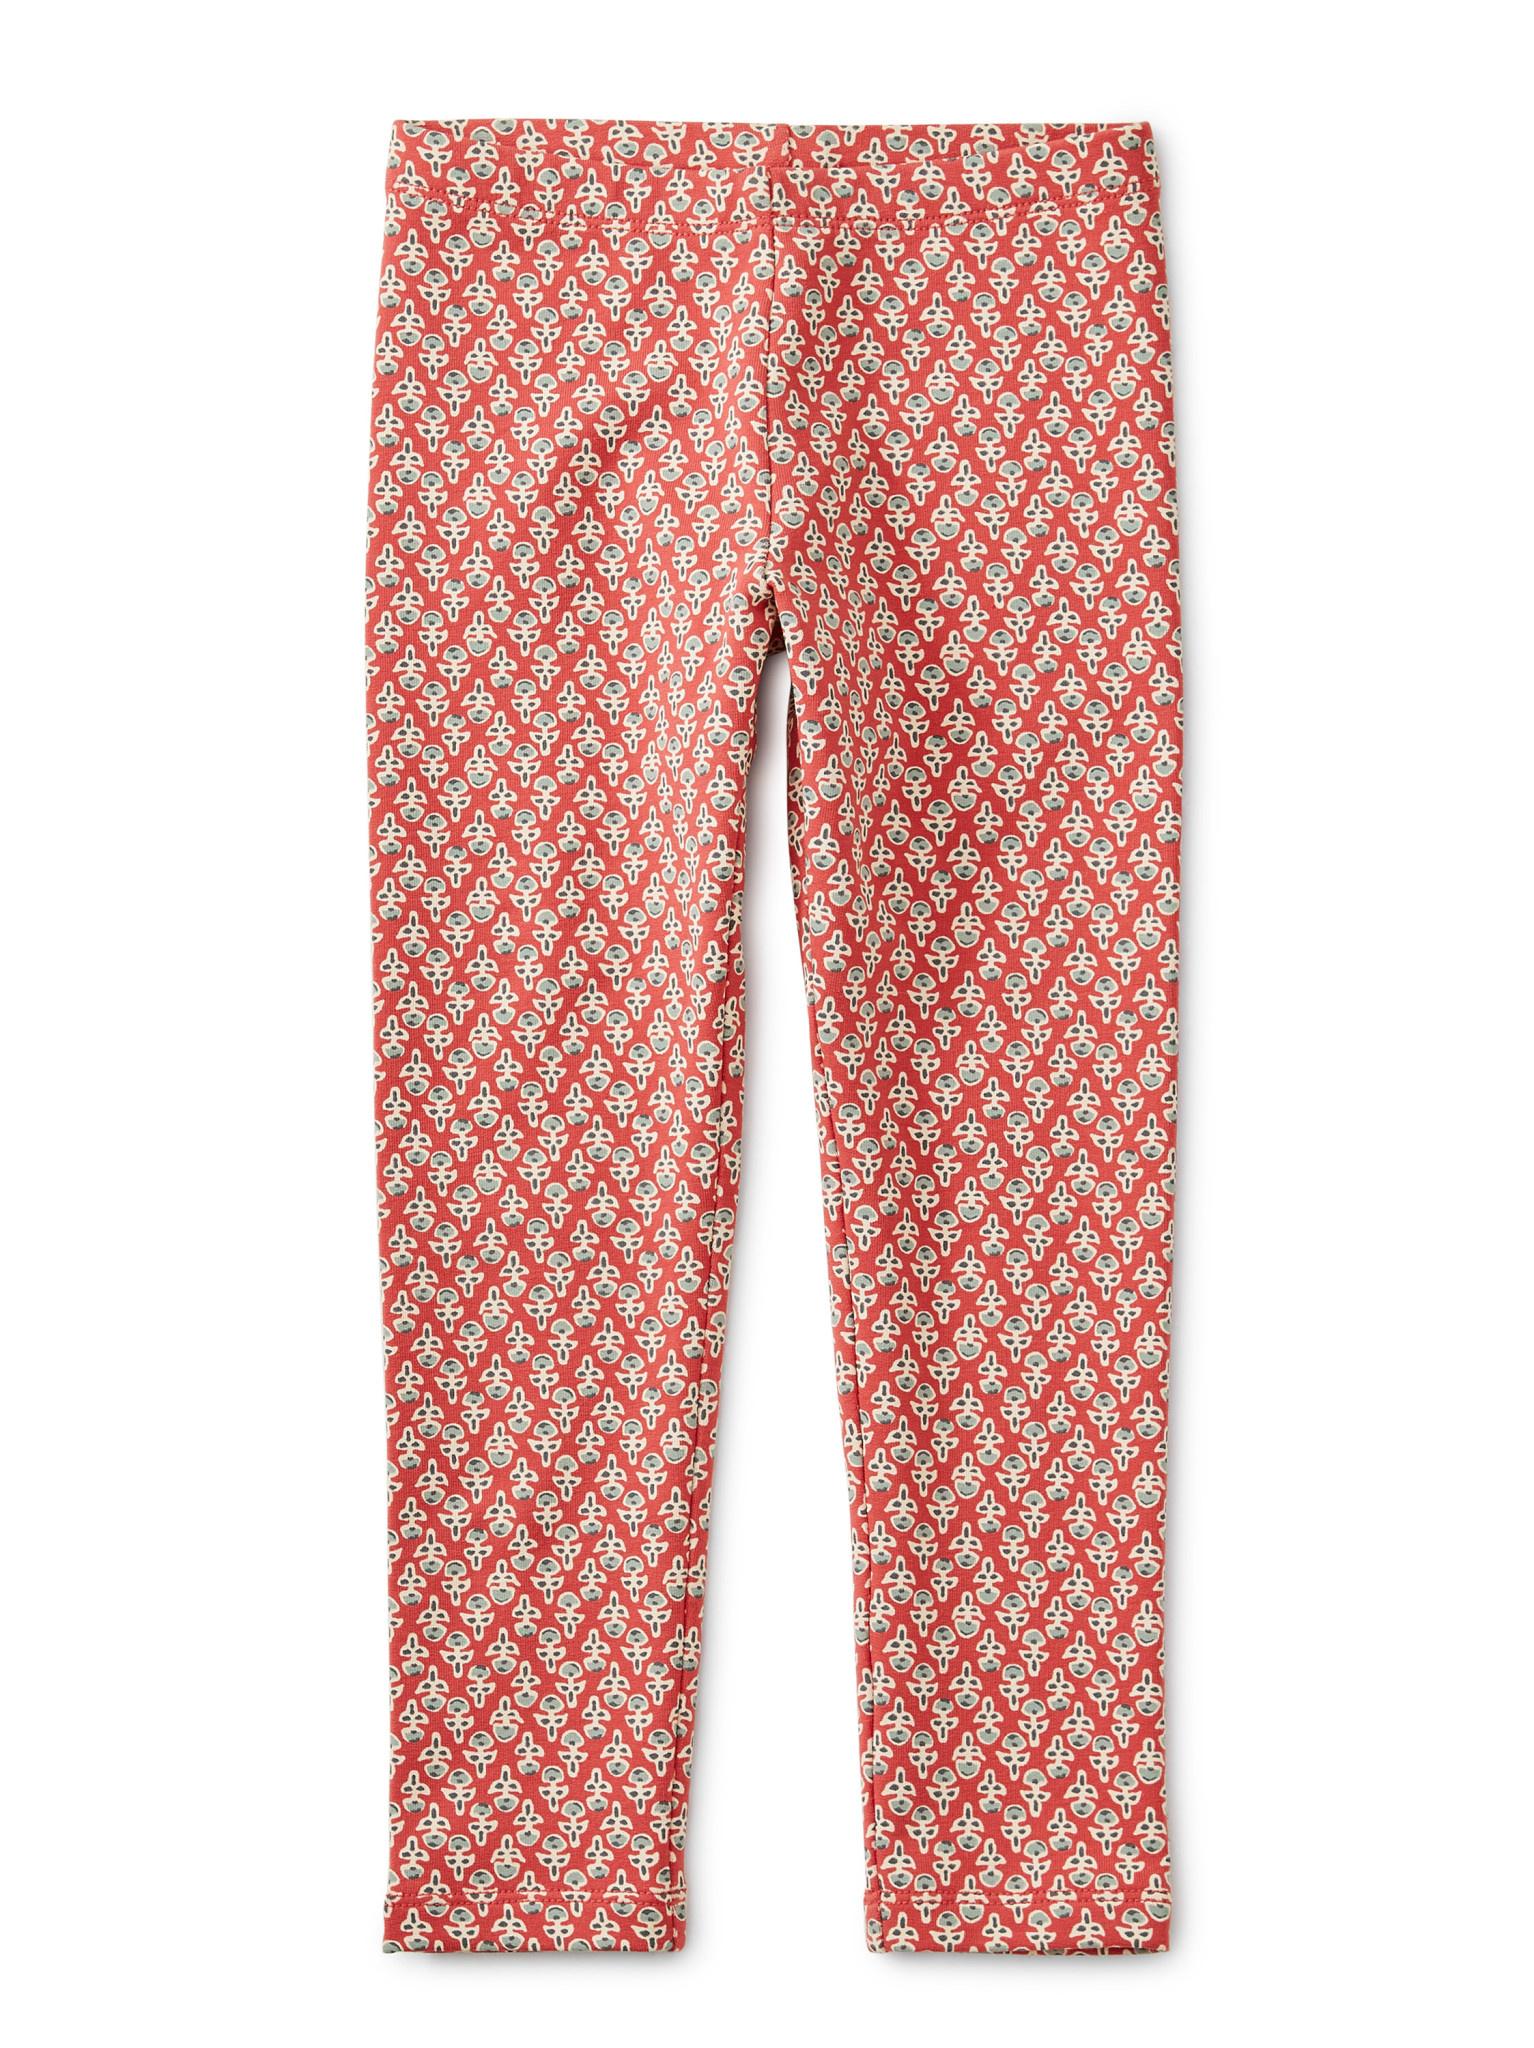 Tea Collection Poppy Blockprint Cozy Leggings